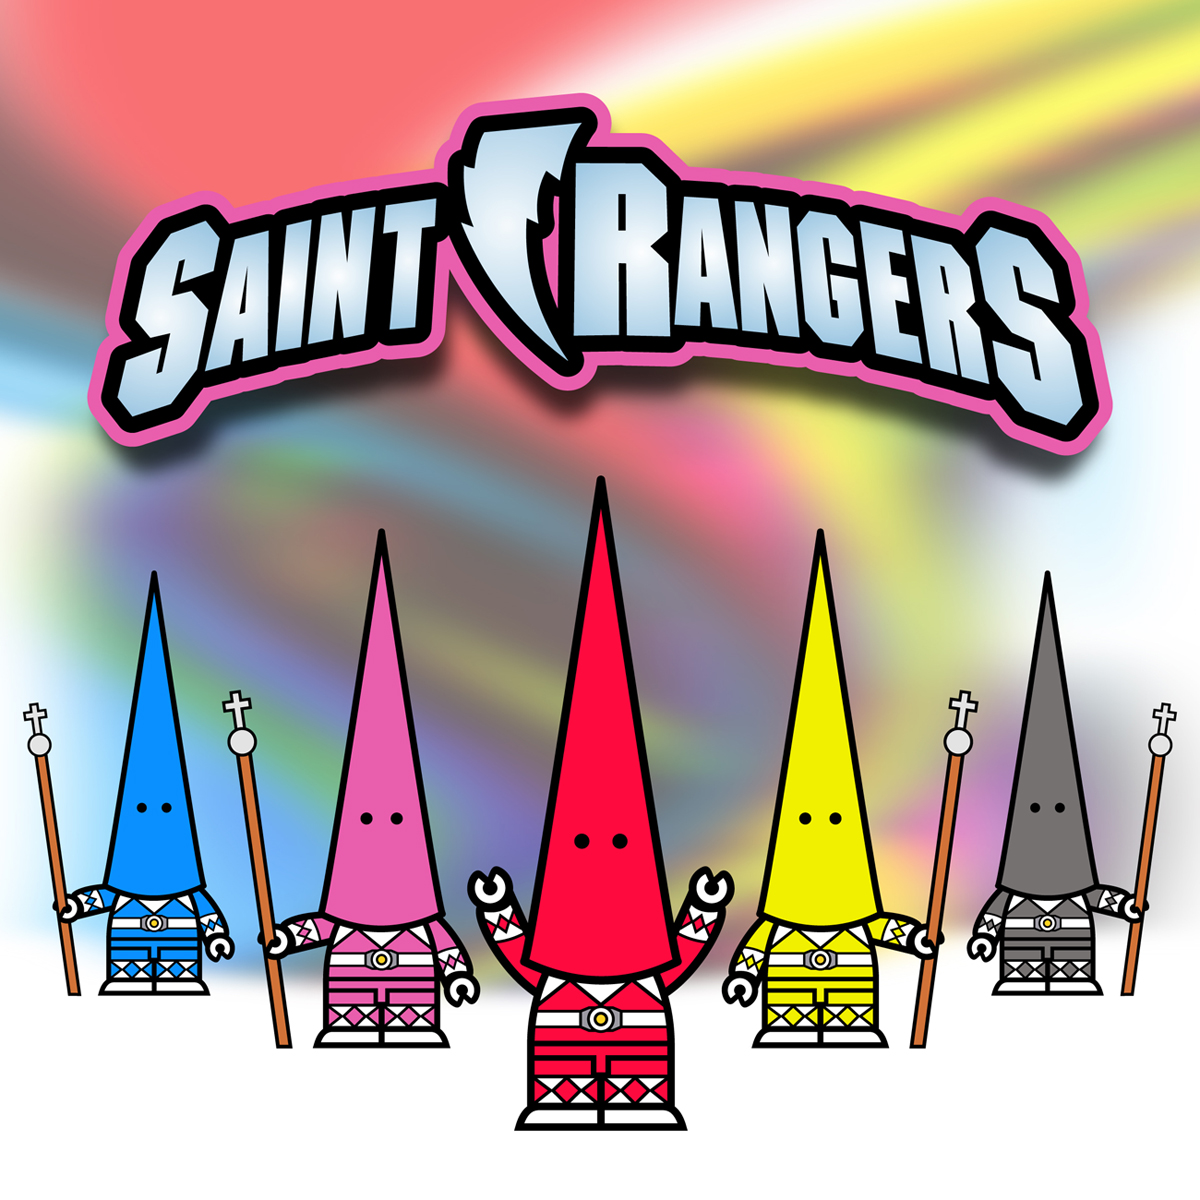 Saint Rangers by Renato Seixas - Creative Work